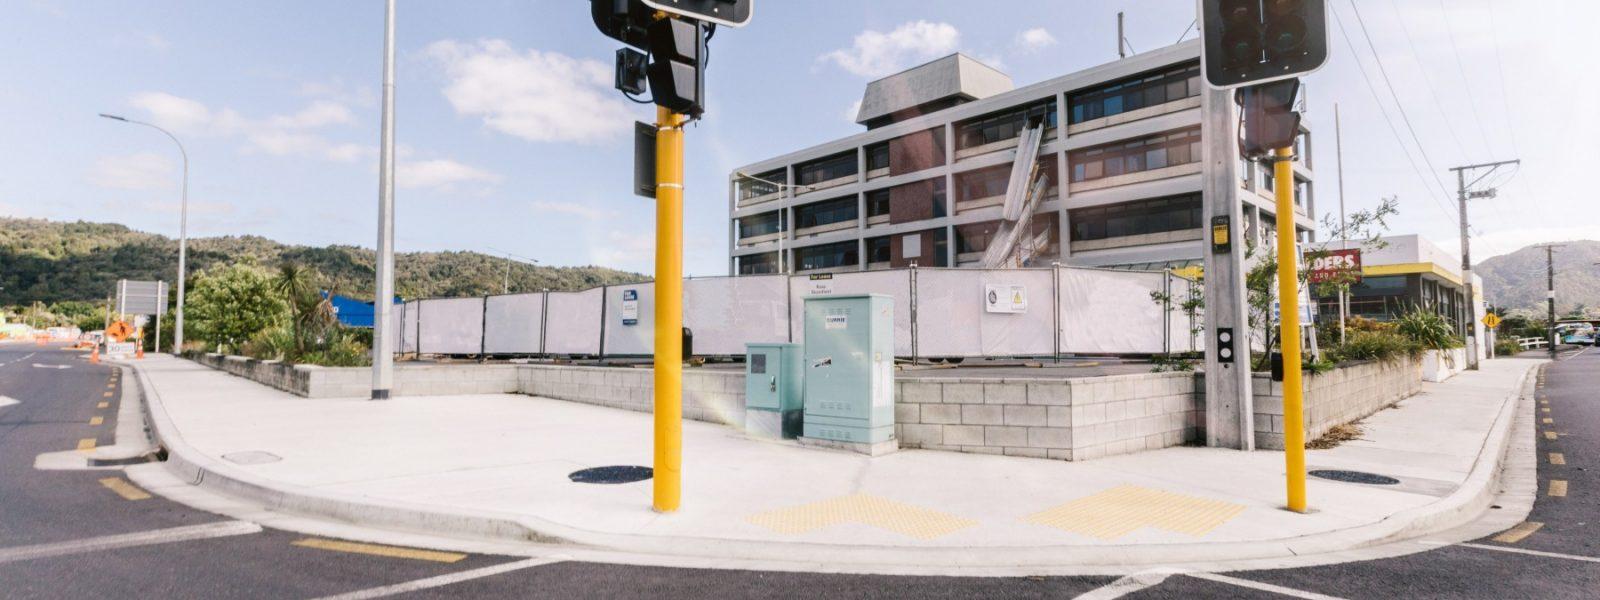 Porowini / Tarewa Intersection - Header Image